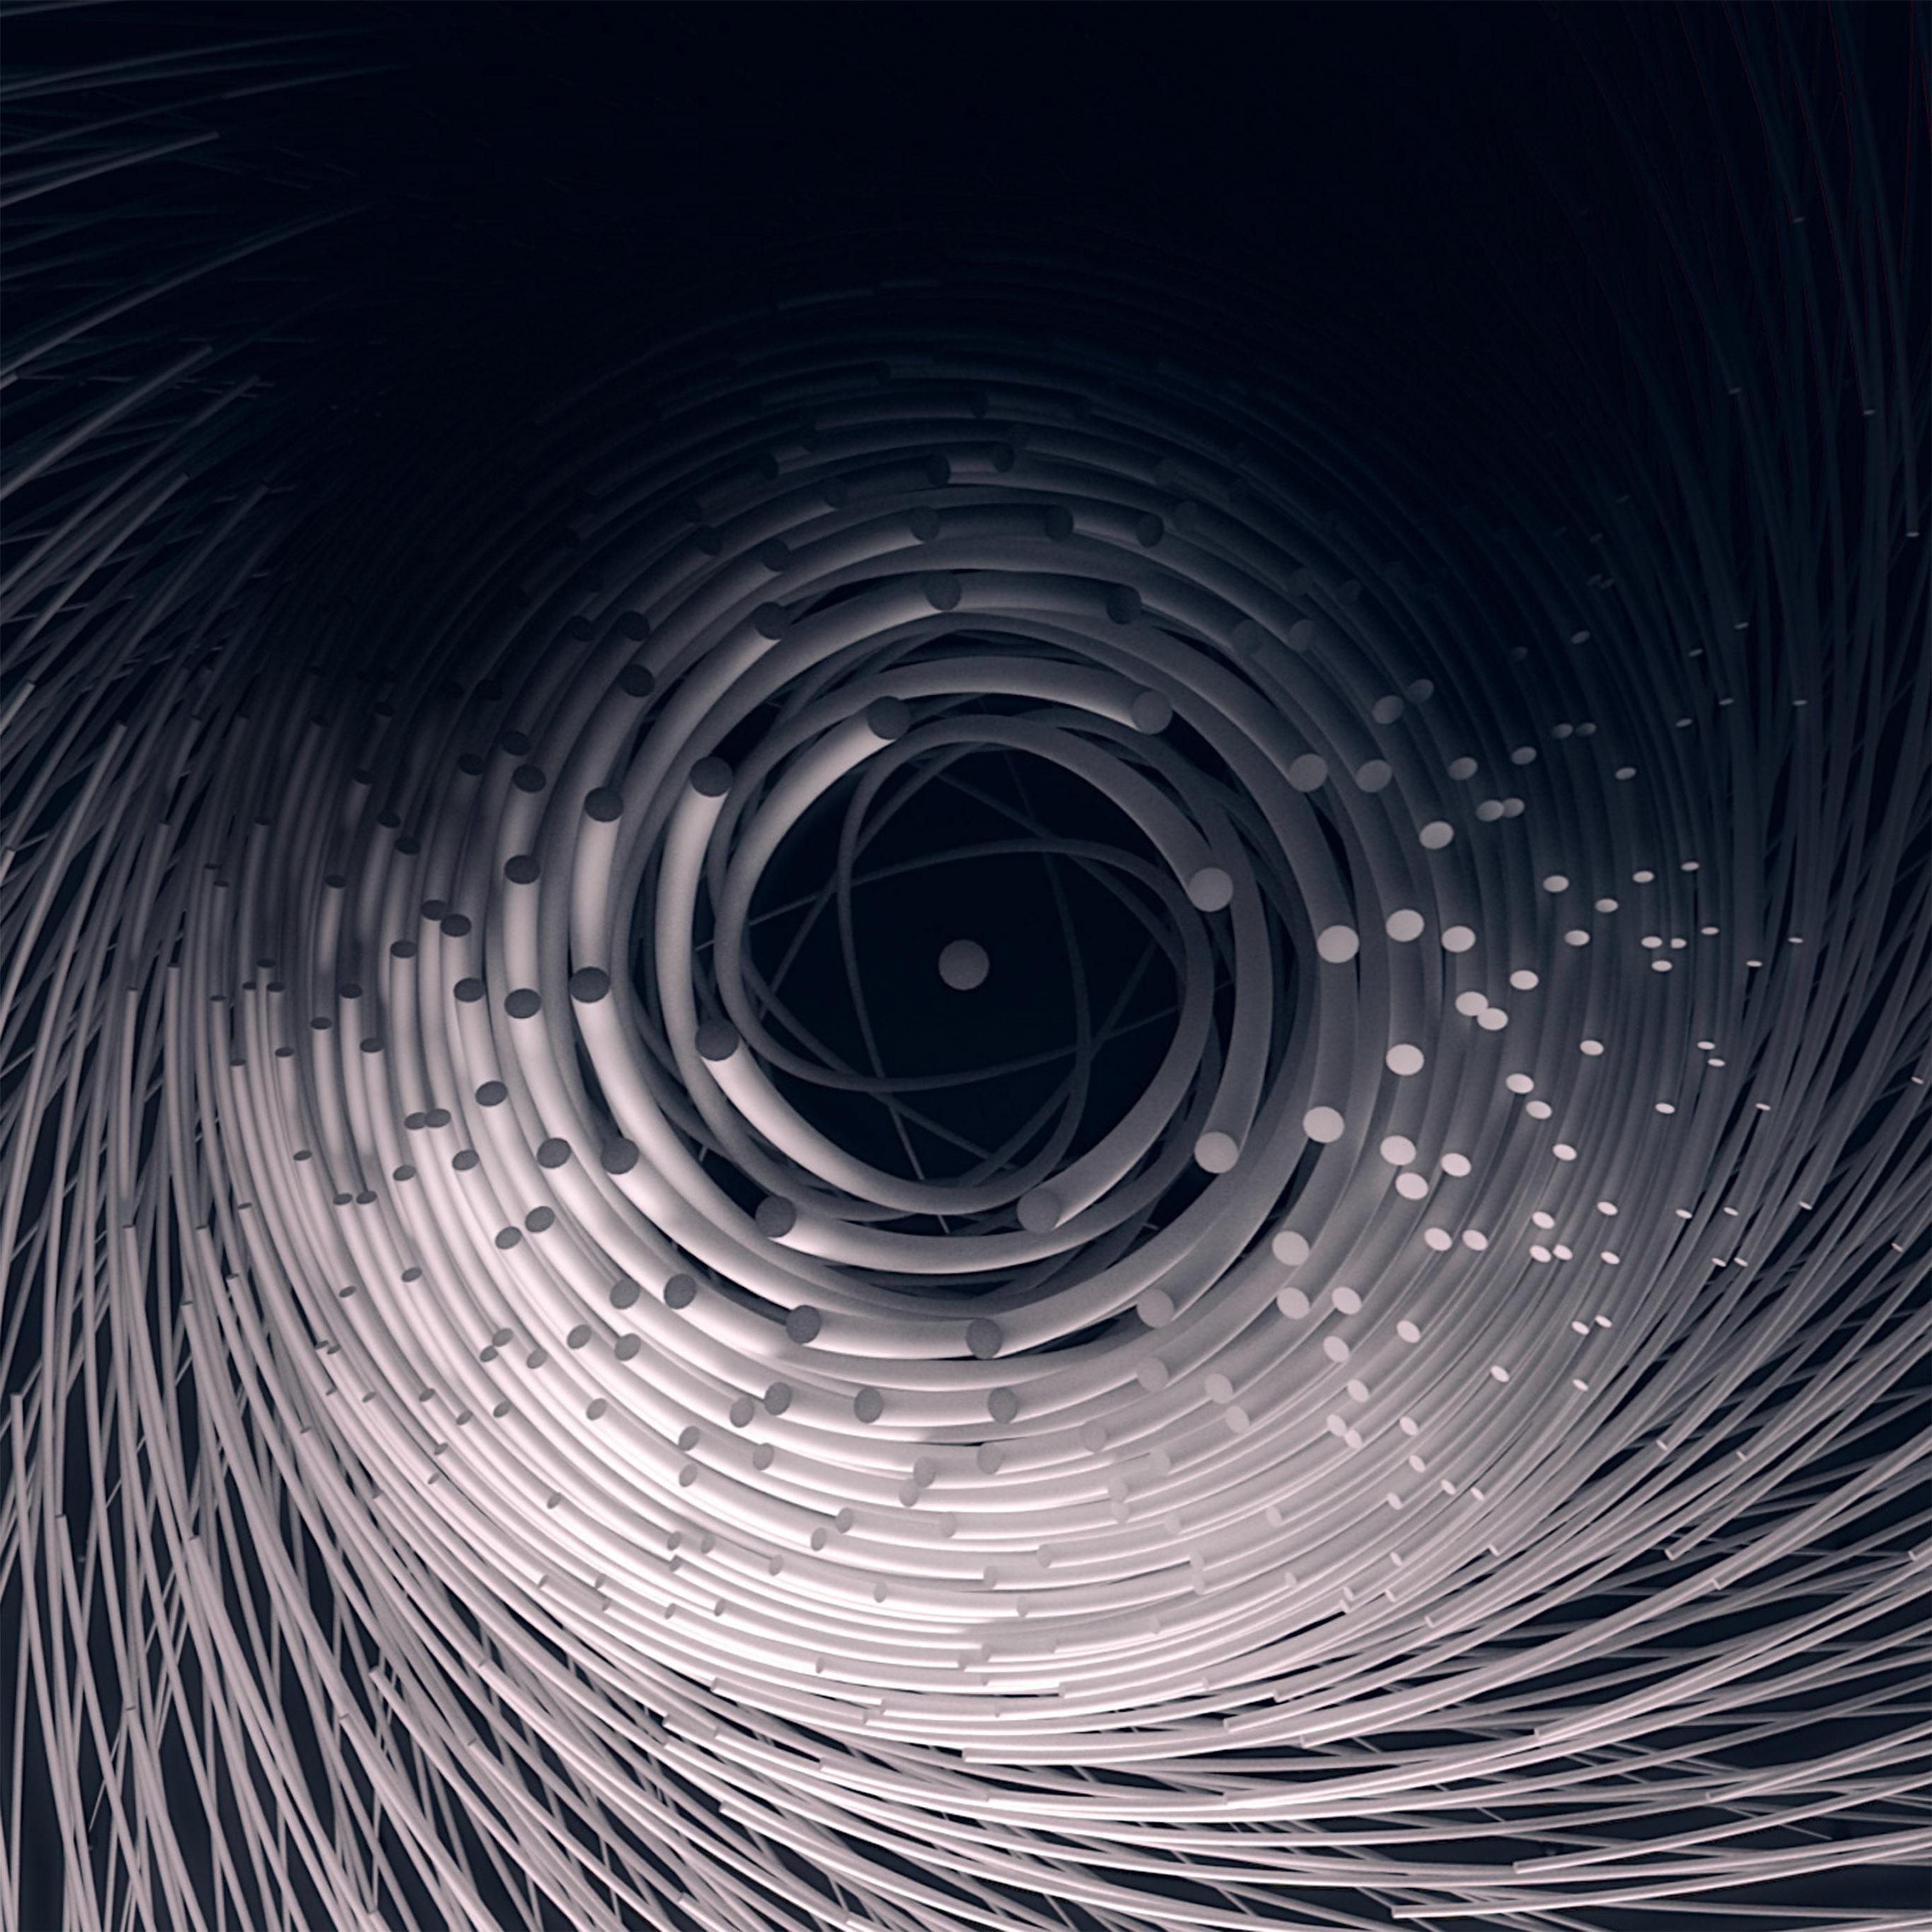 Circle Wallpaper: Ax83-circle-3d-dark-abstact-illustration-art-fantastic